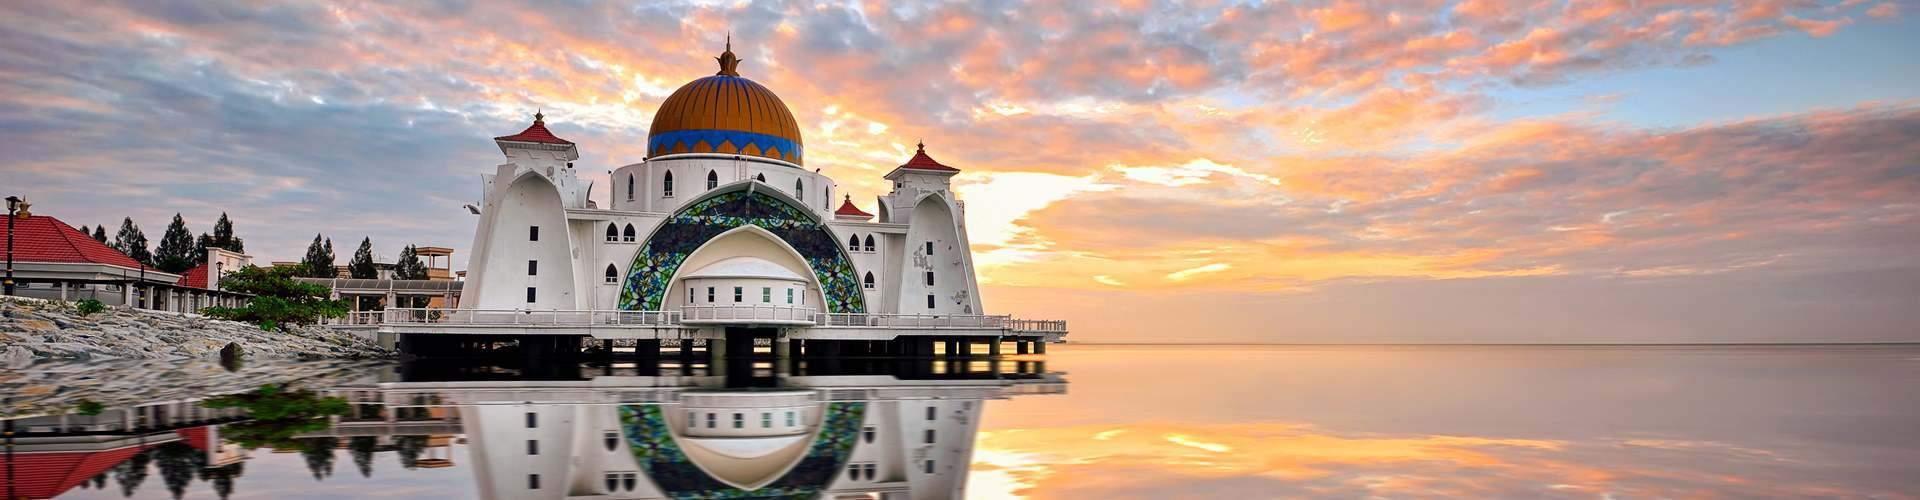 Straits Mosque Malacca